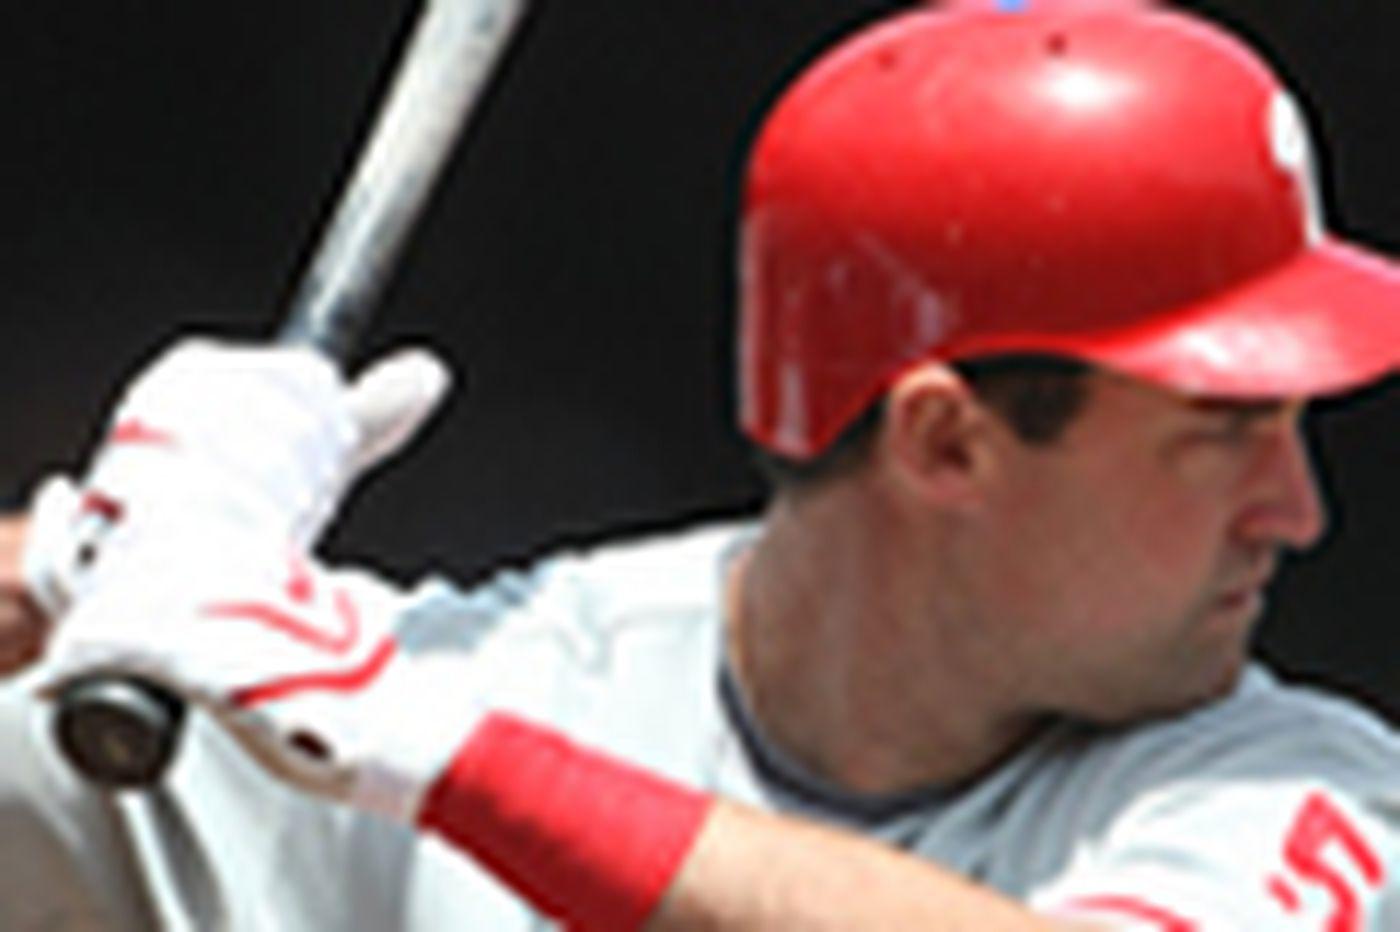 Phillies' Pat Burrell focuses on the present